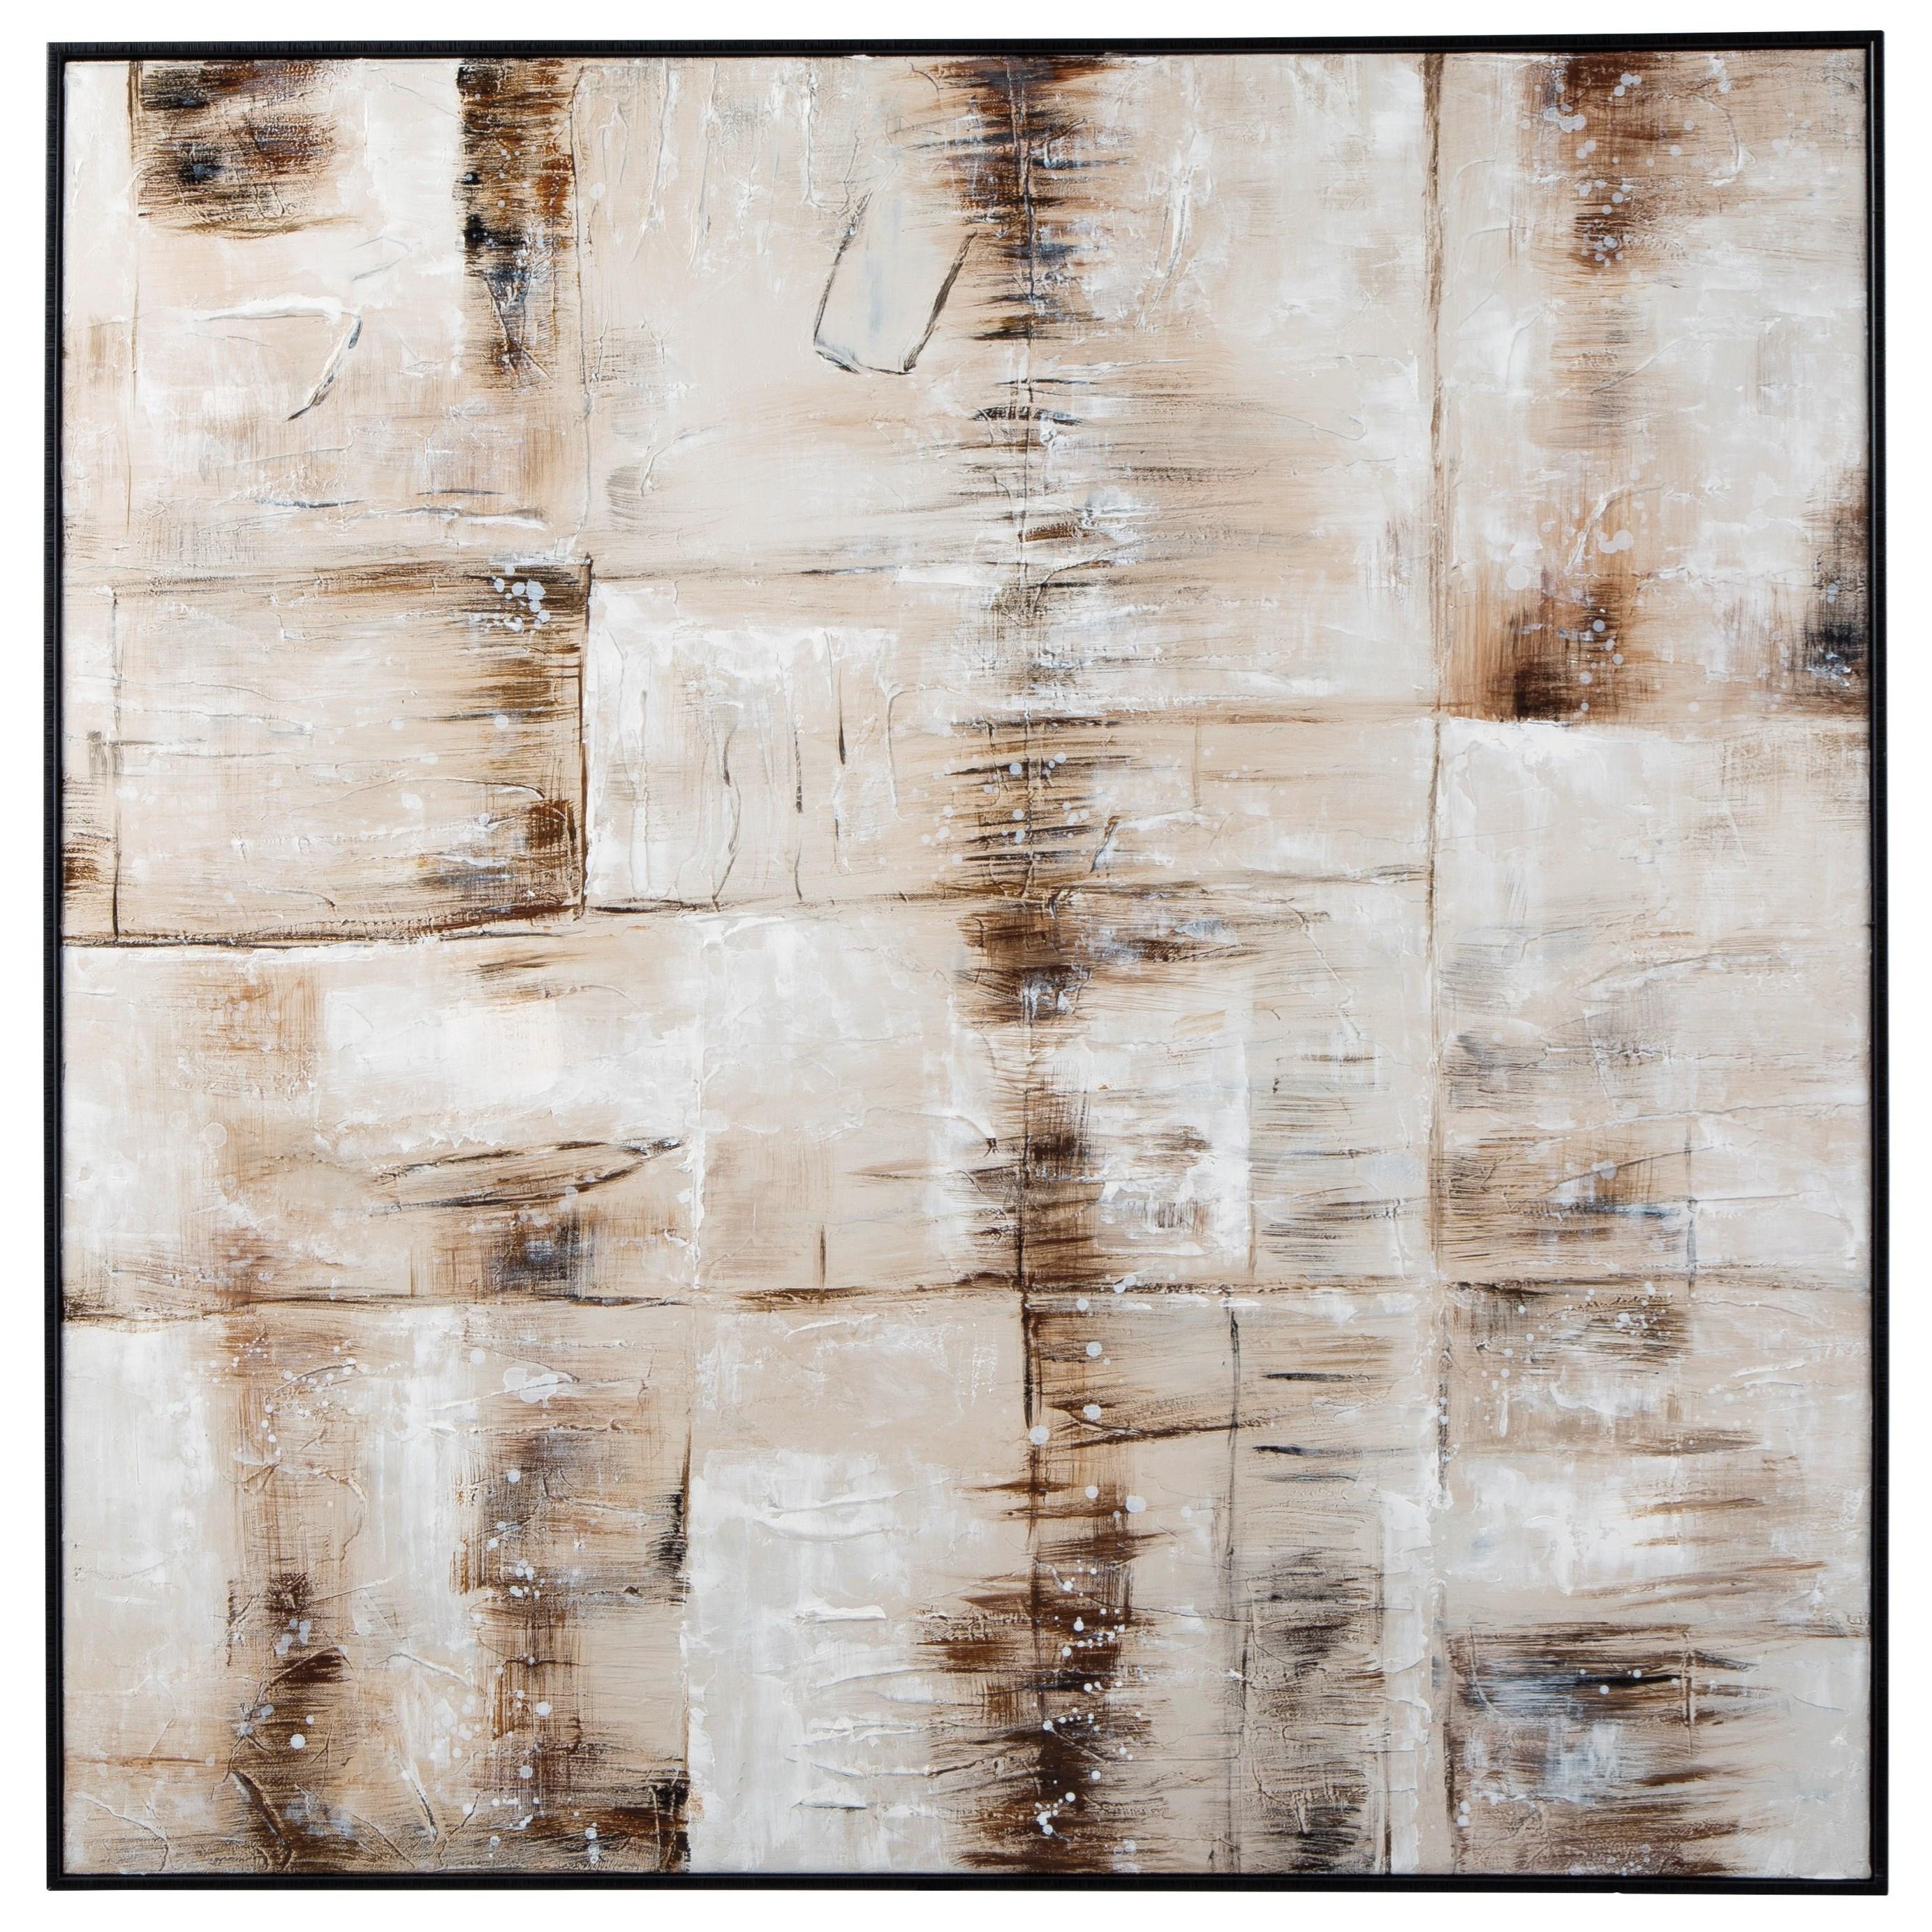 Jovia Tan/Brown Wall Art